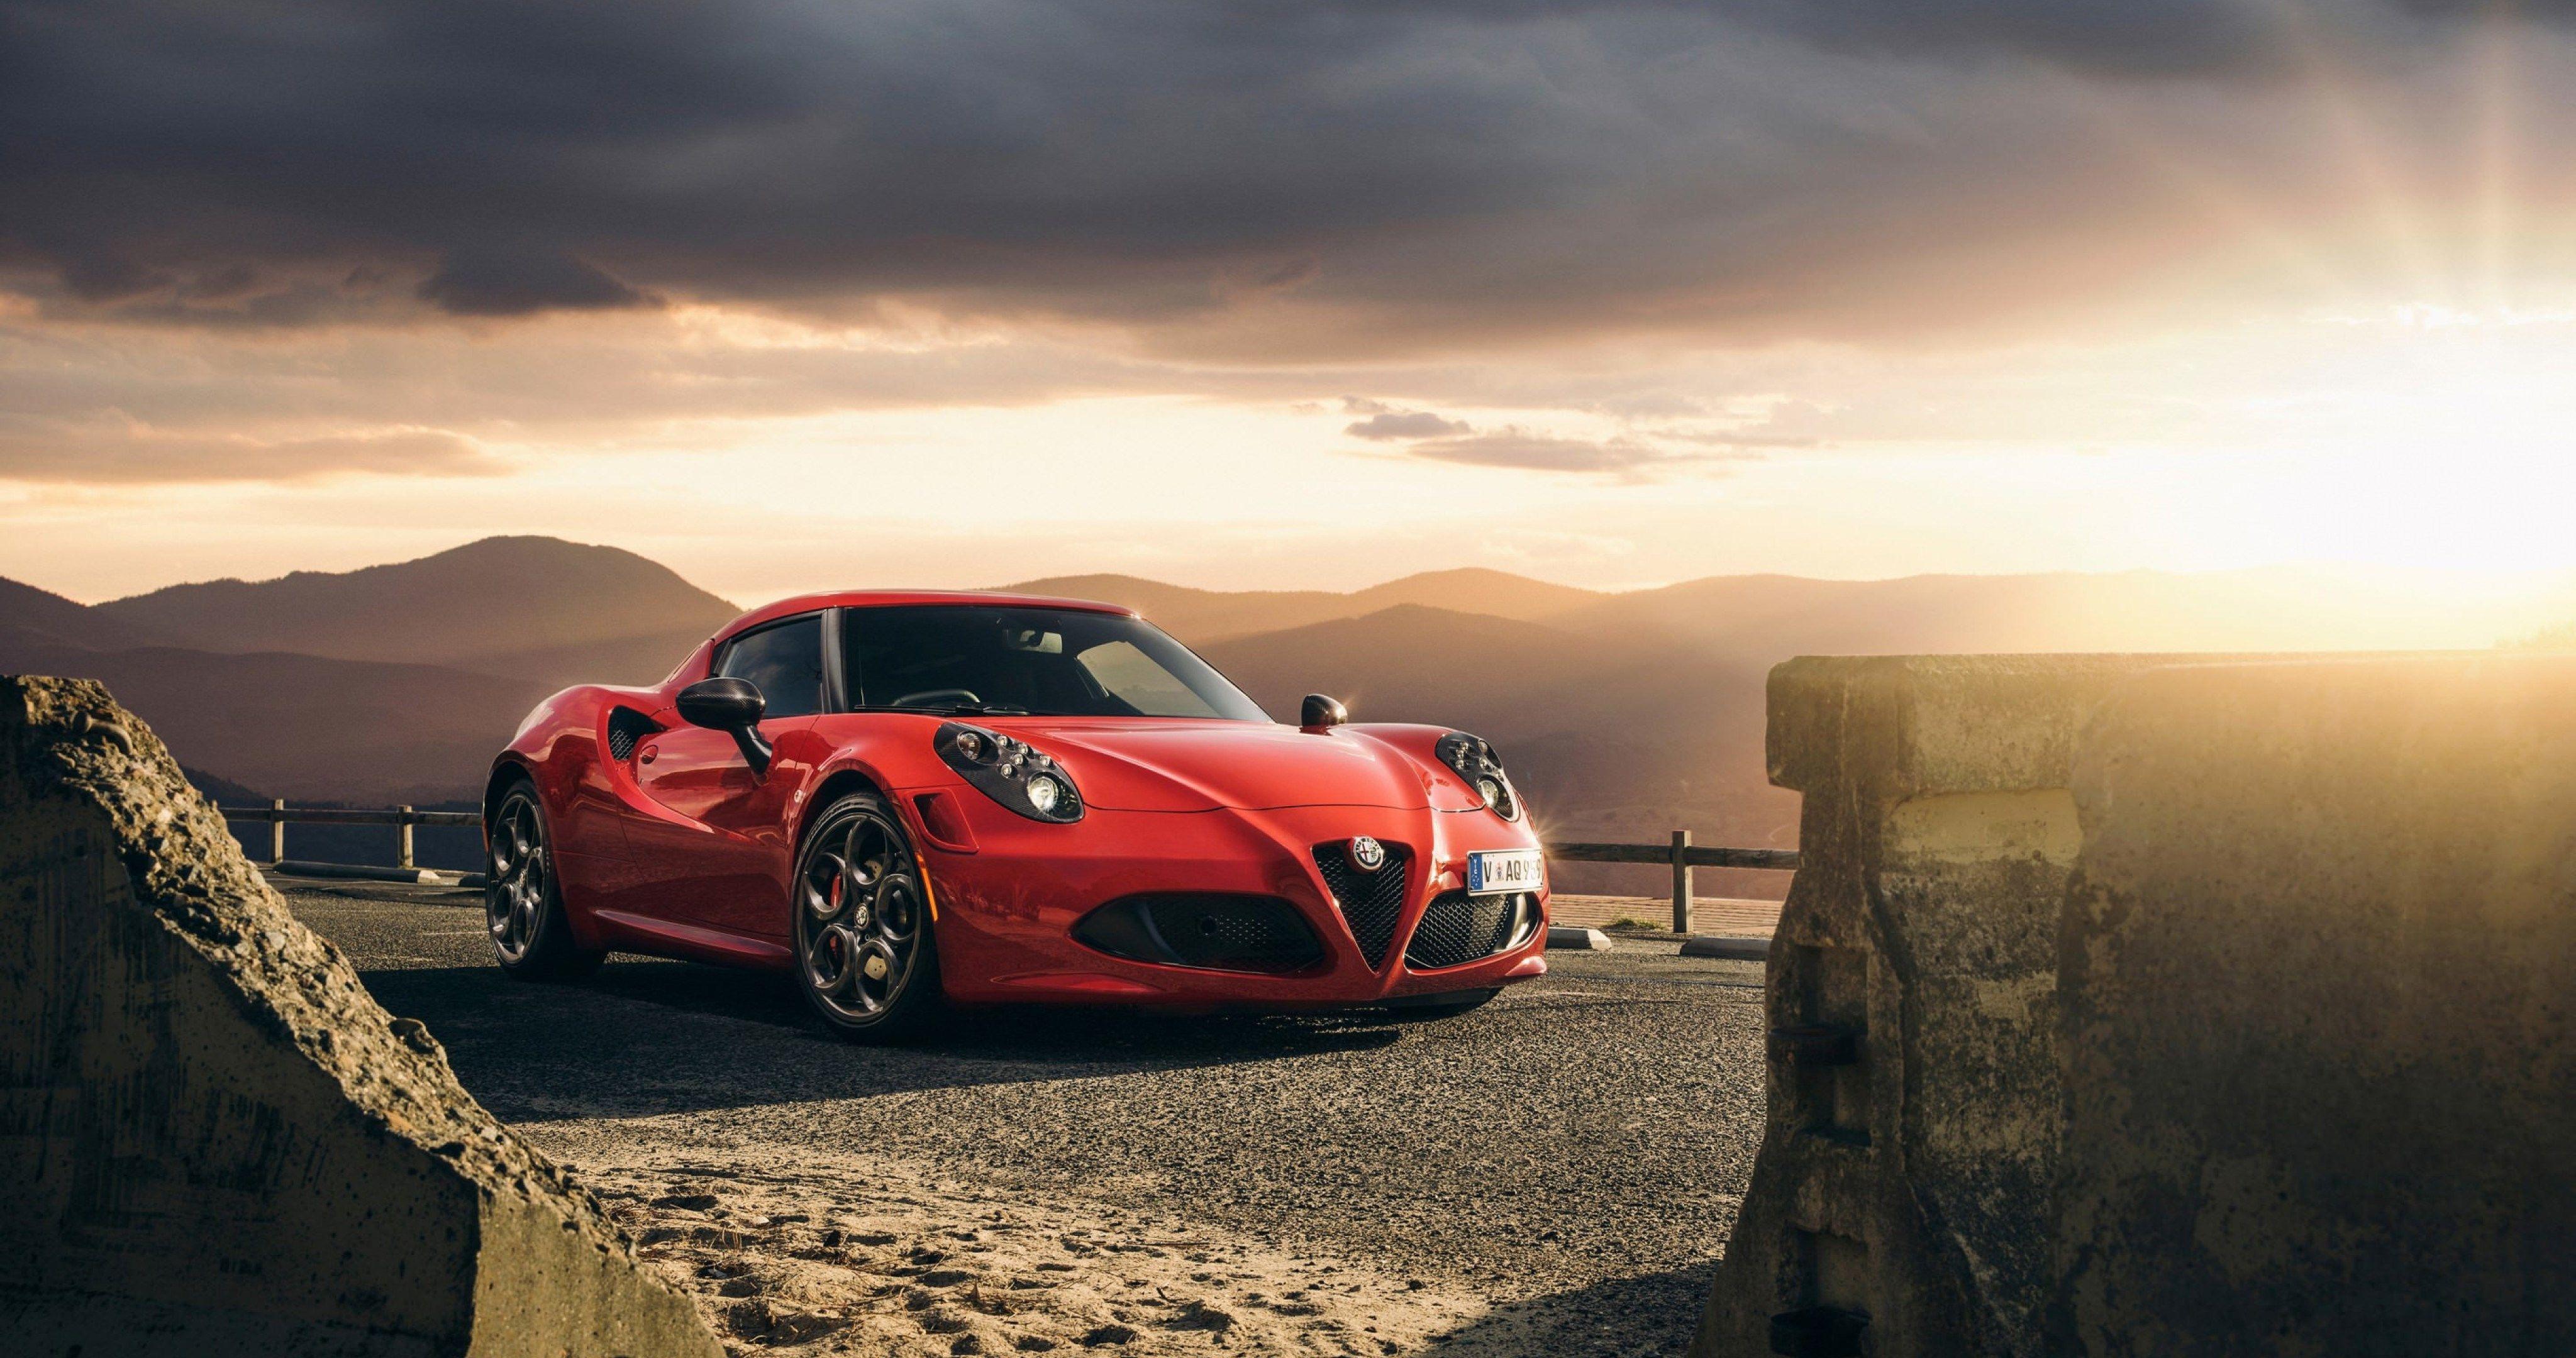 Alfa Romeo 4C Wallpaper – Auto Bild Idee